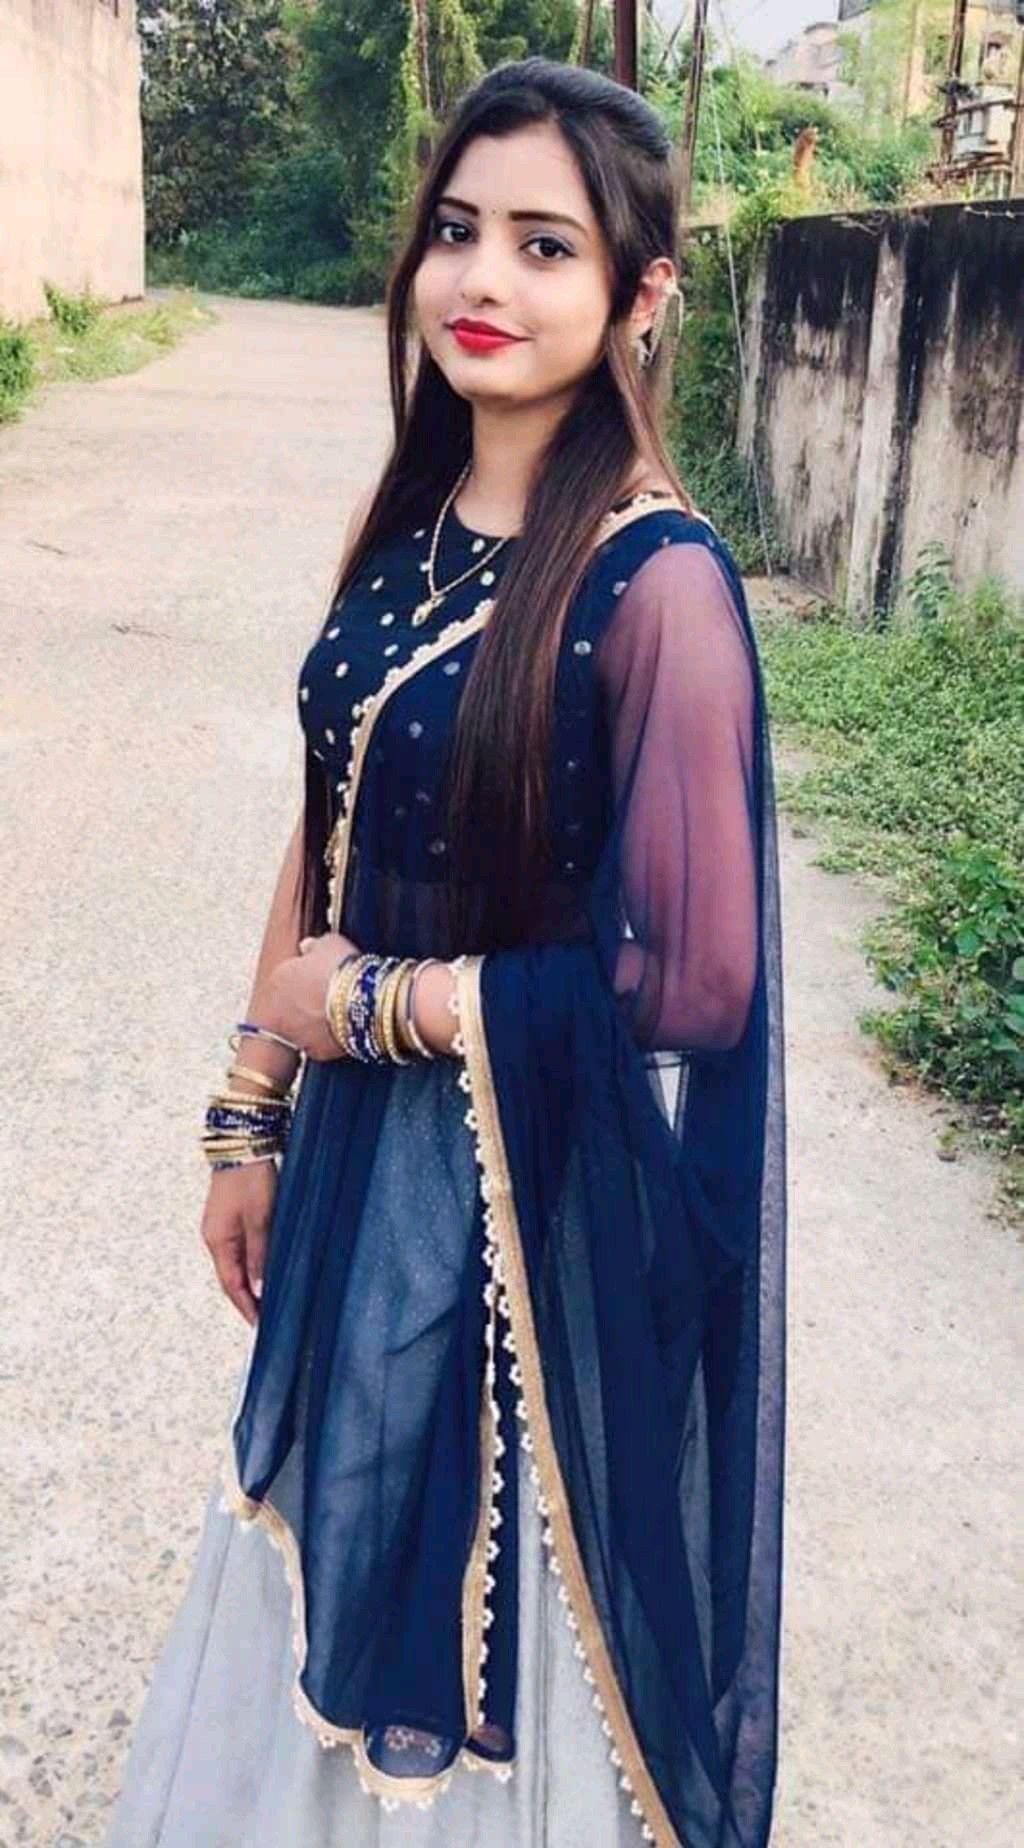 Indian Teenage Girls Pics For Whatsapp, Facebook-5211